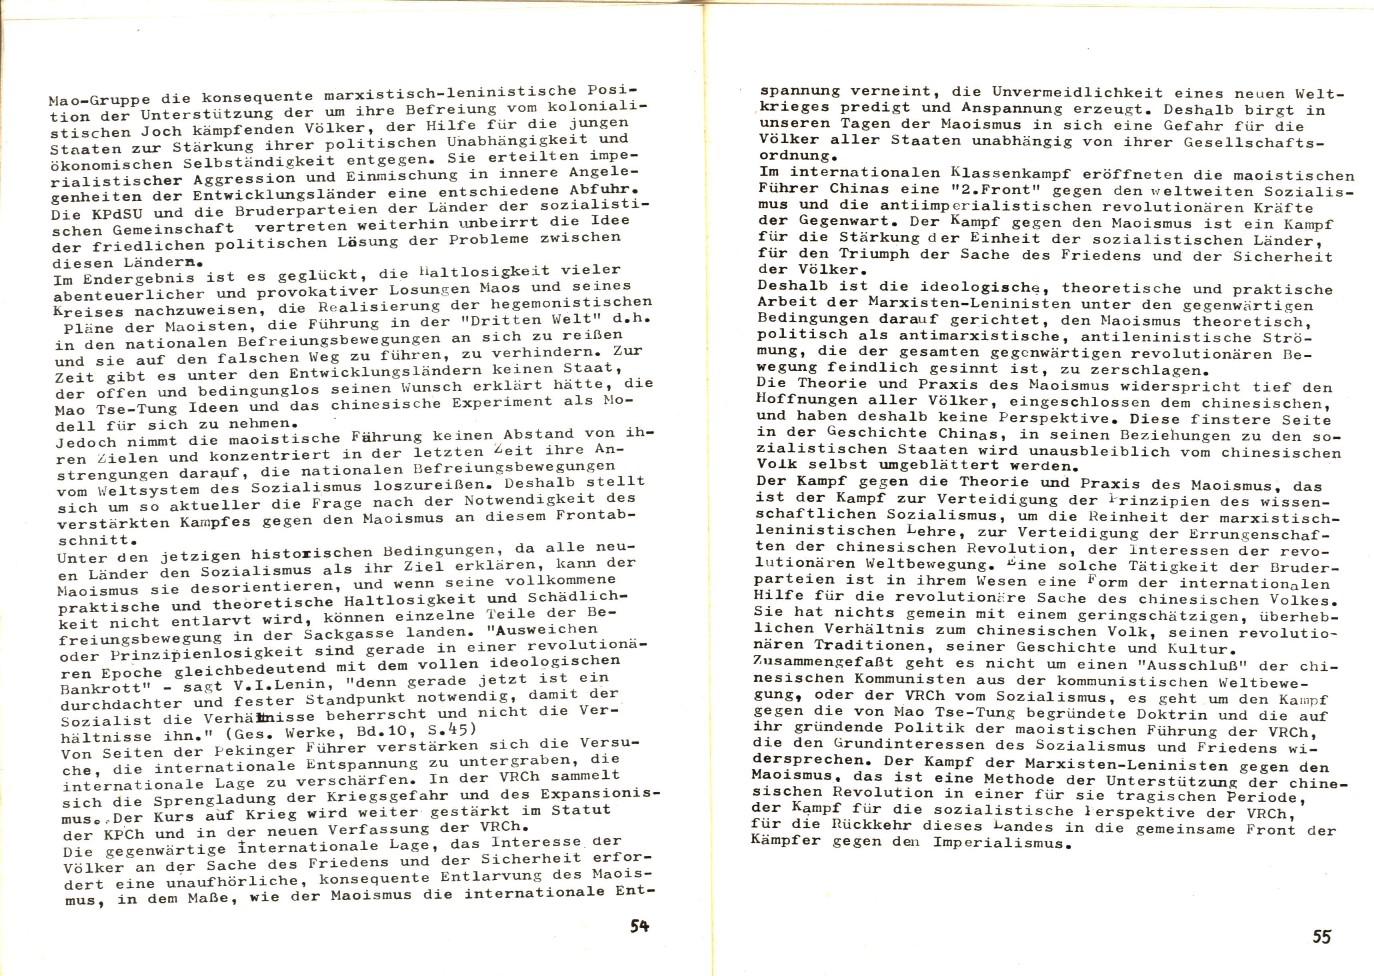 Berlin_KSV_1975_Dokumente_der_SAZ_29